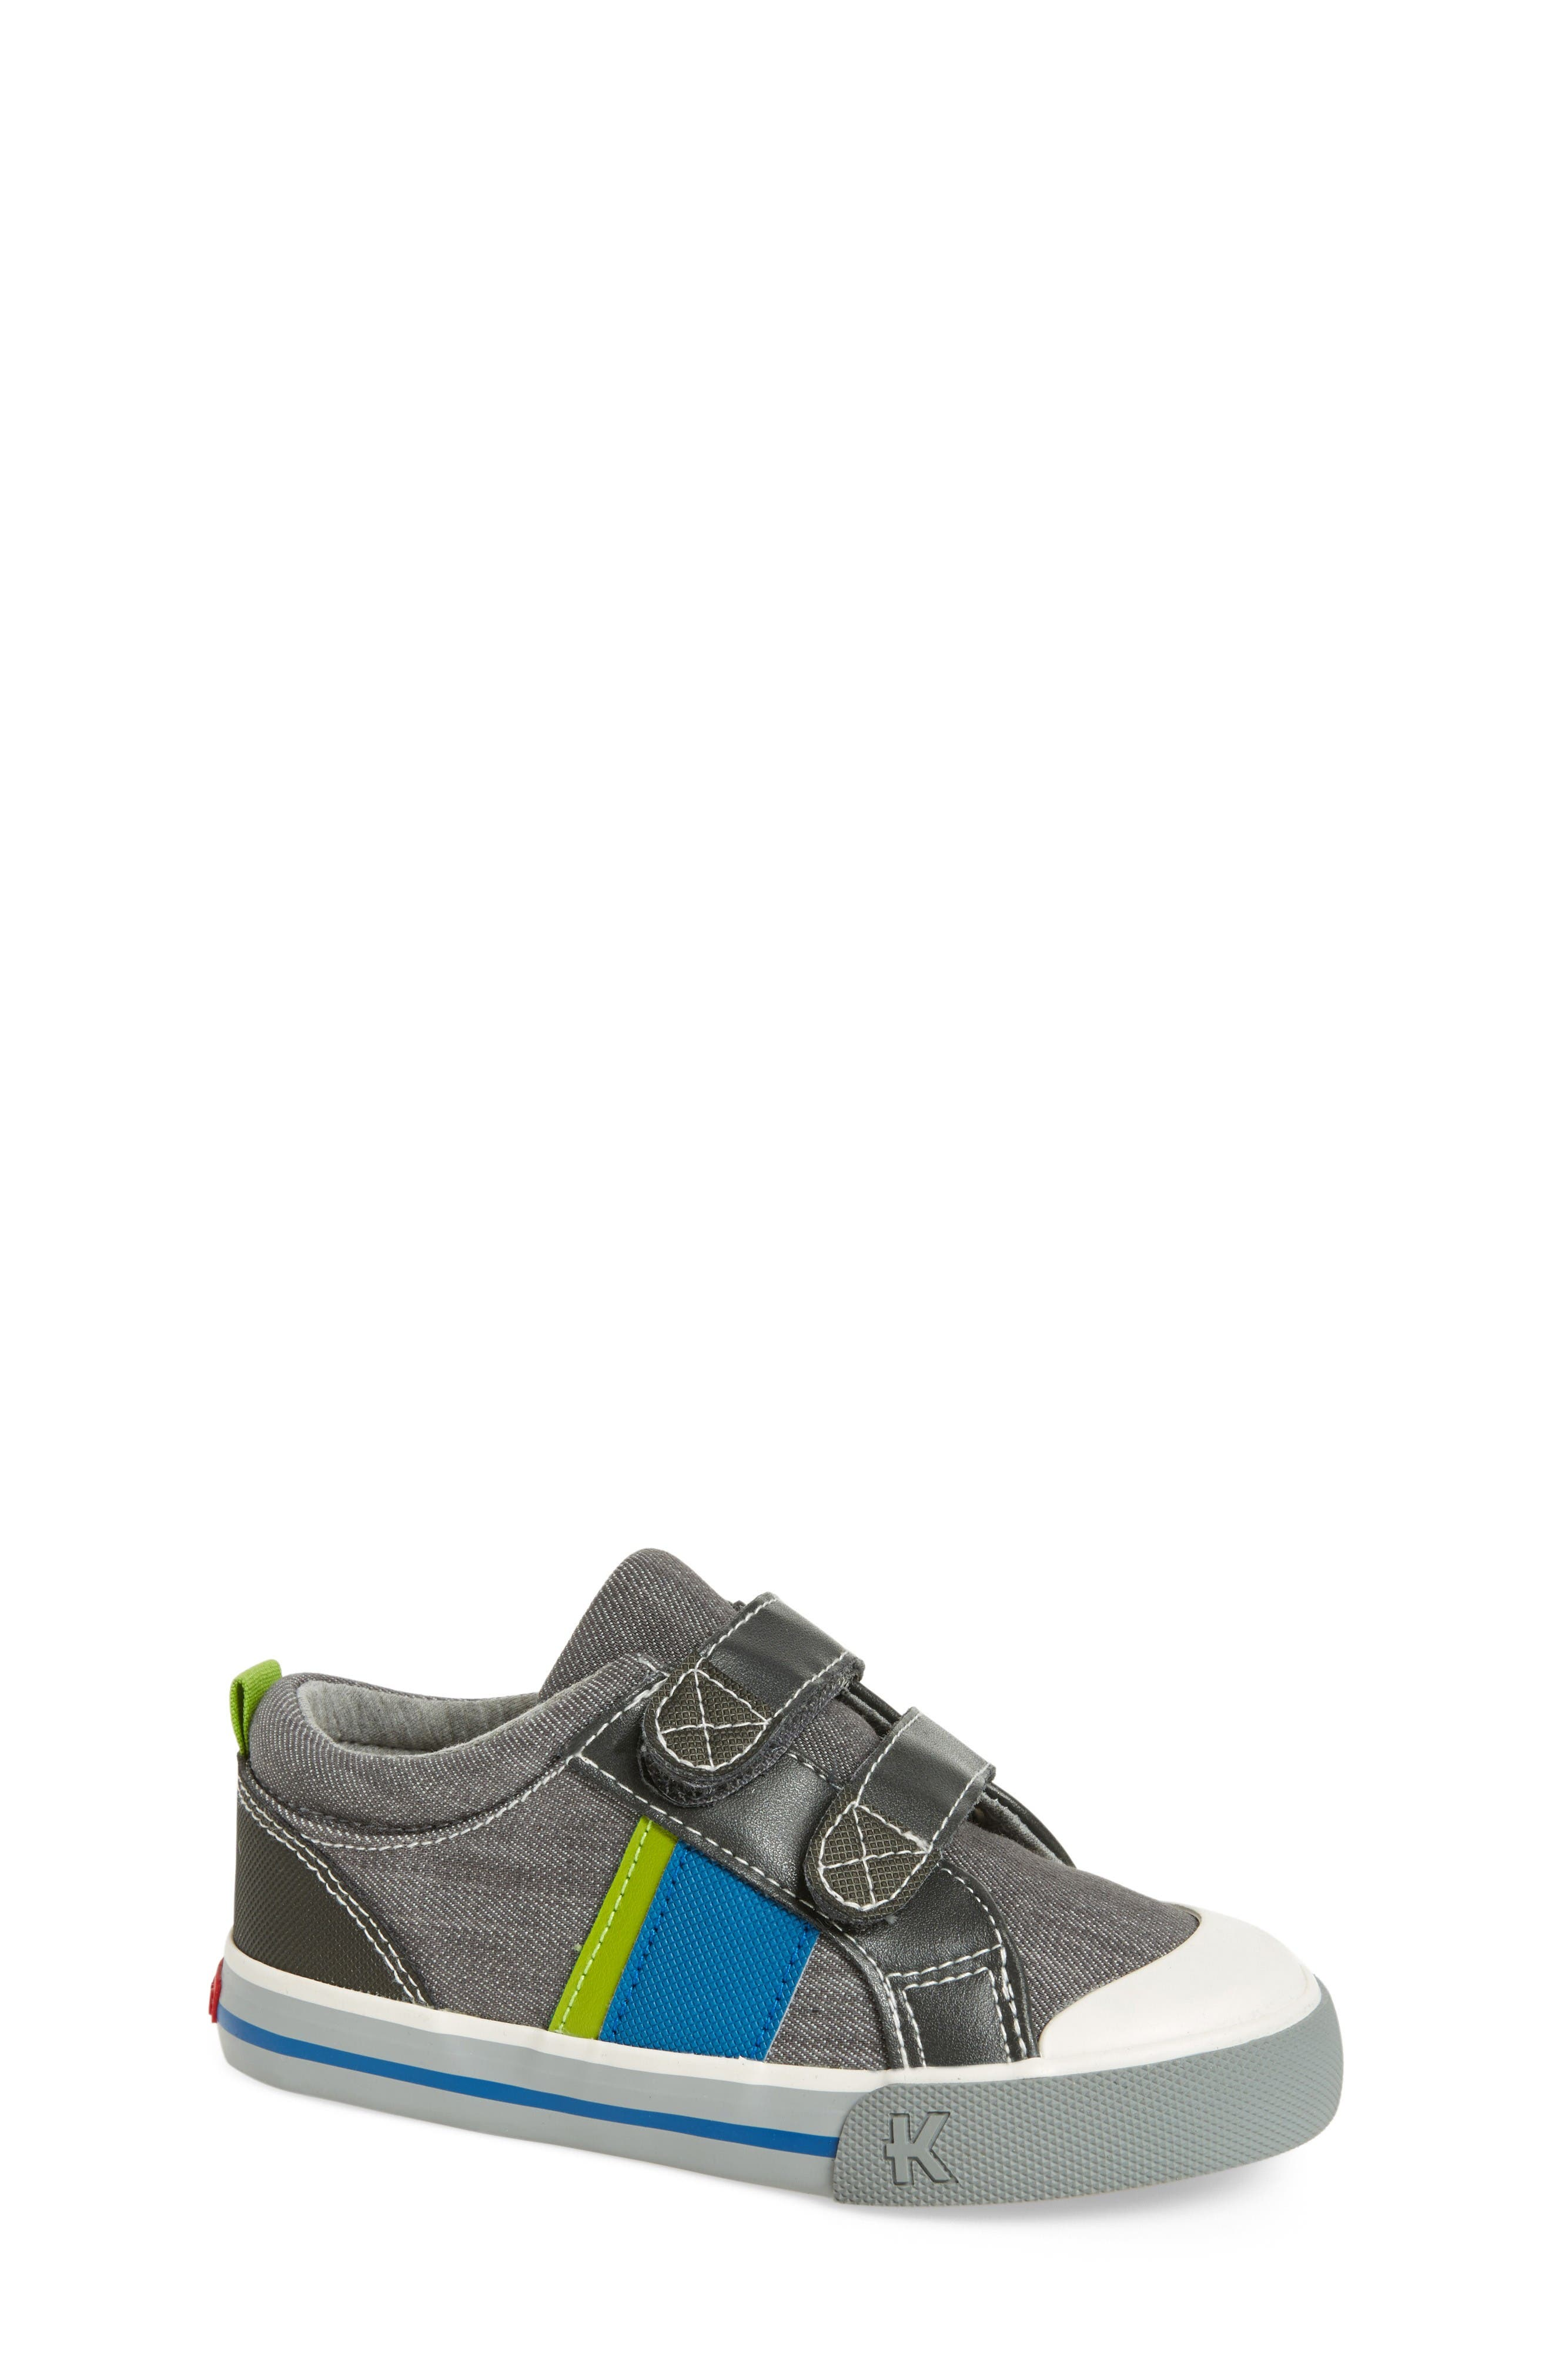 See Kai Run Russell Sneaker (Toddler & Little Kid)